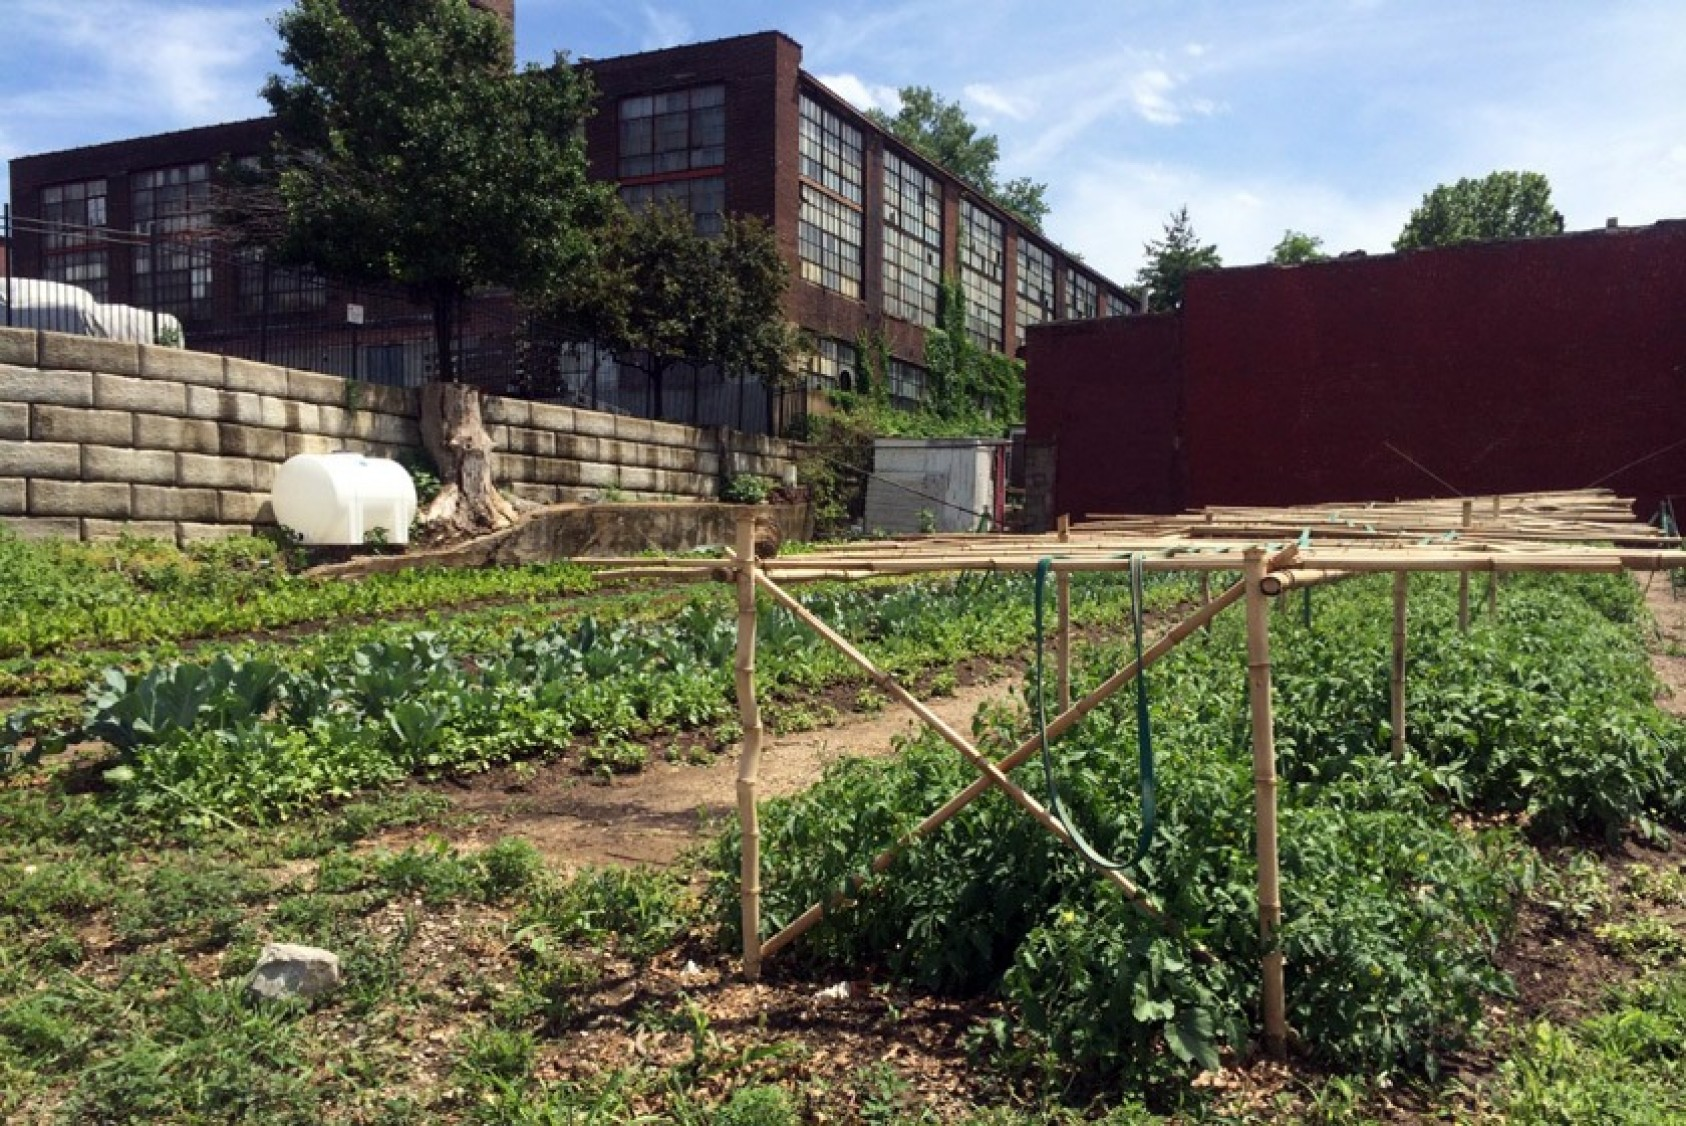 Tomato plants in the urban garden